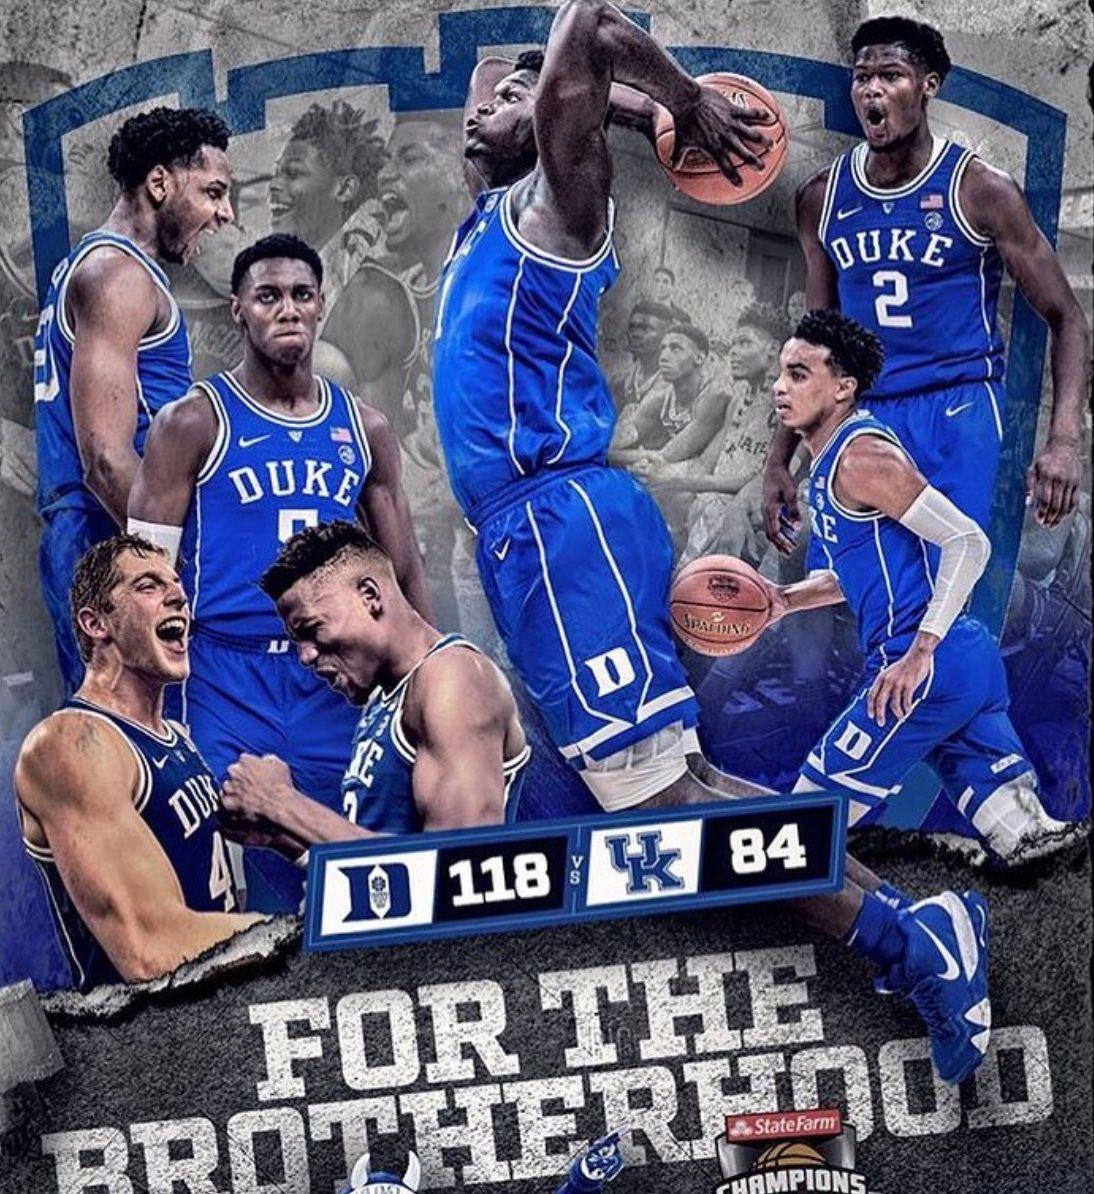 Pin By Zoey On Duke Mbb Duke Blue Devils Basketball Duke Blue Devils Duke Basketball